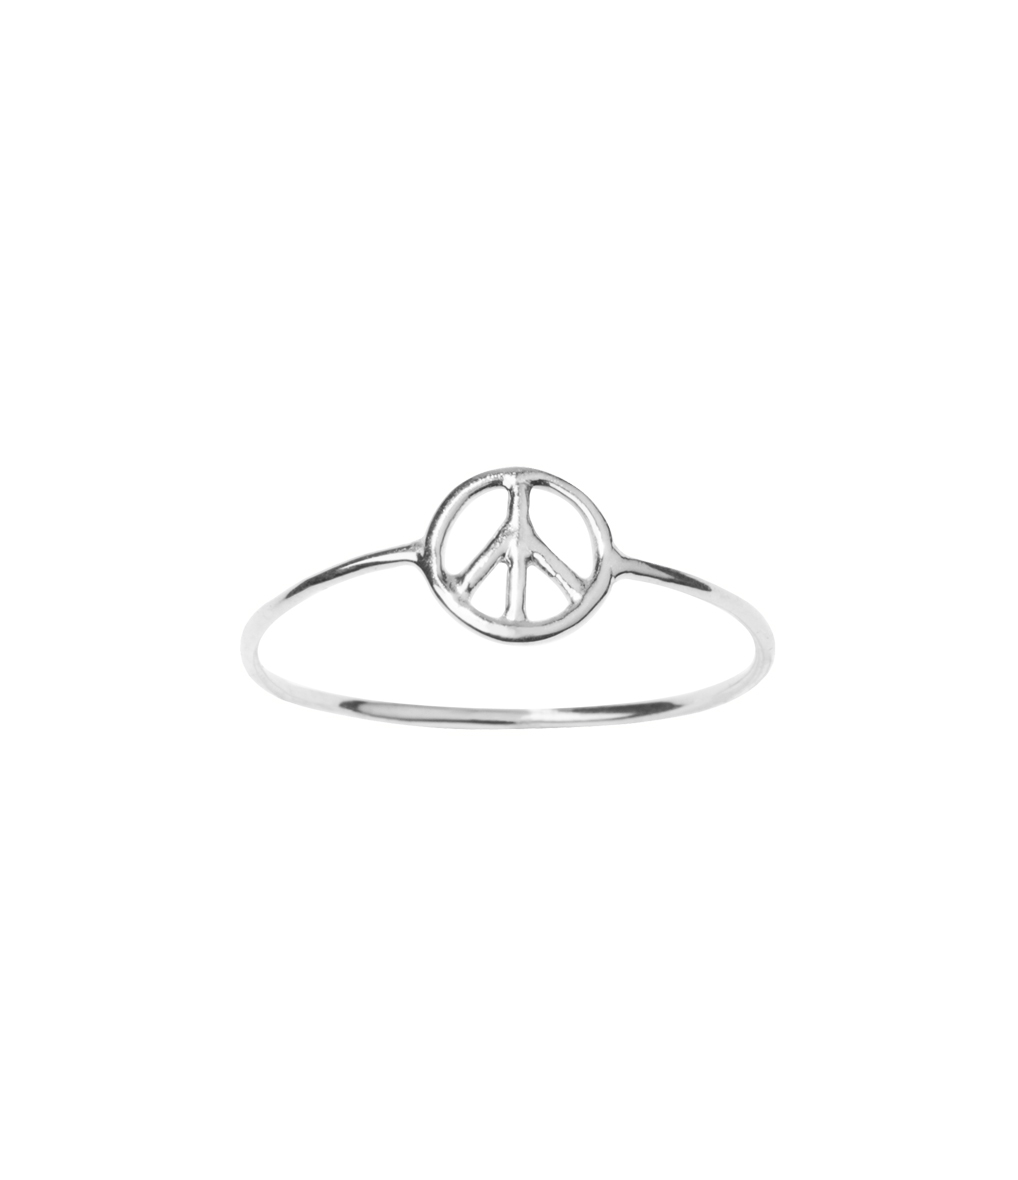 Bague Mini Charms Peace Silver